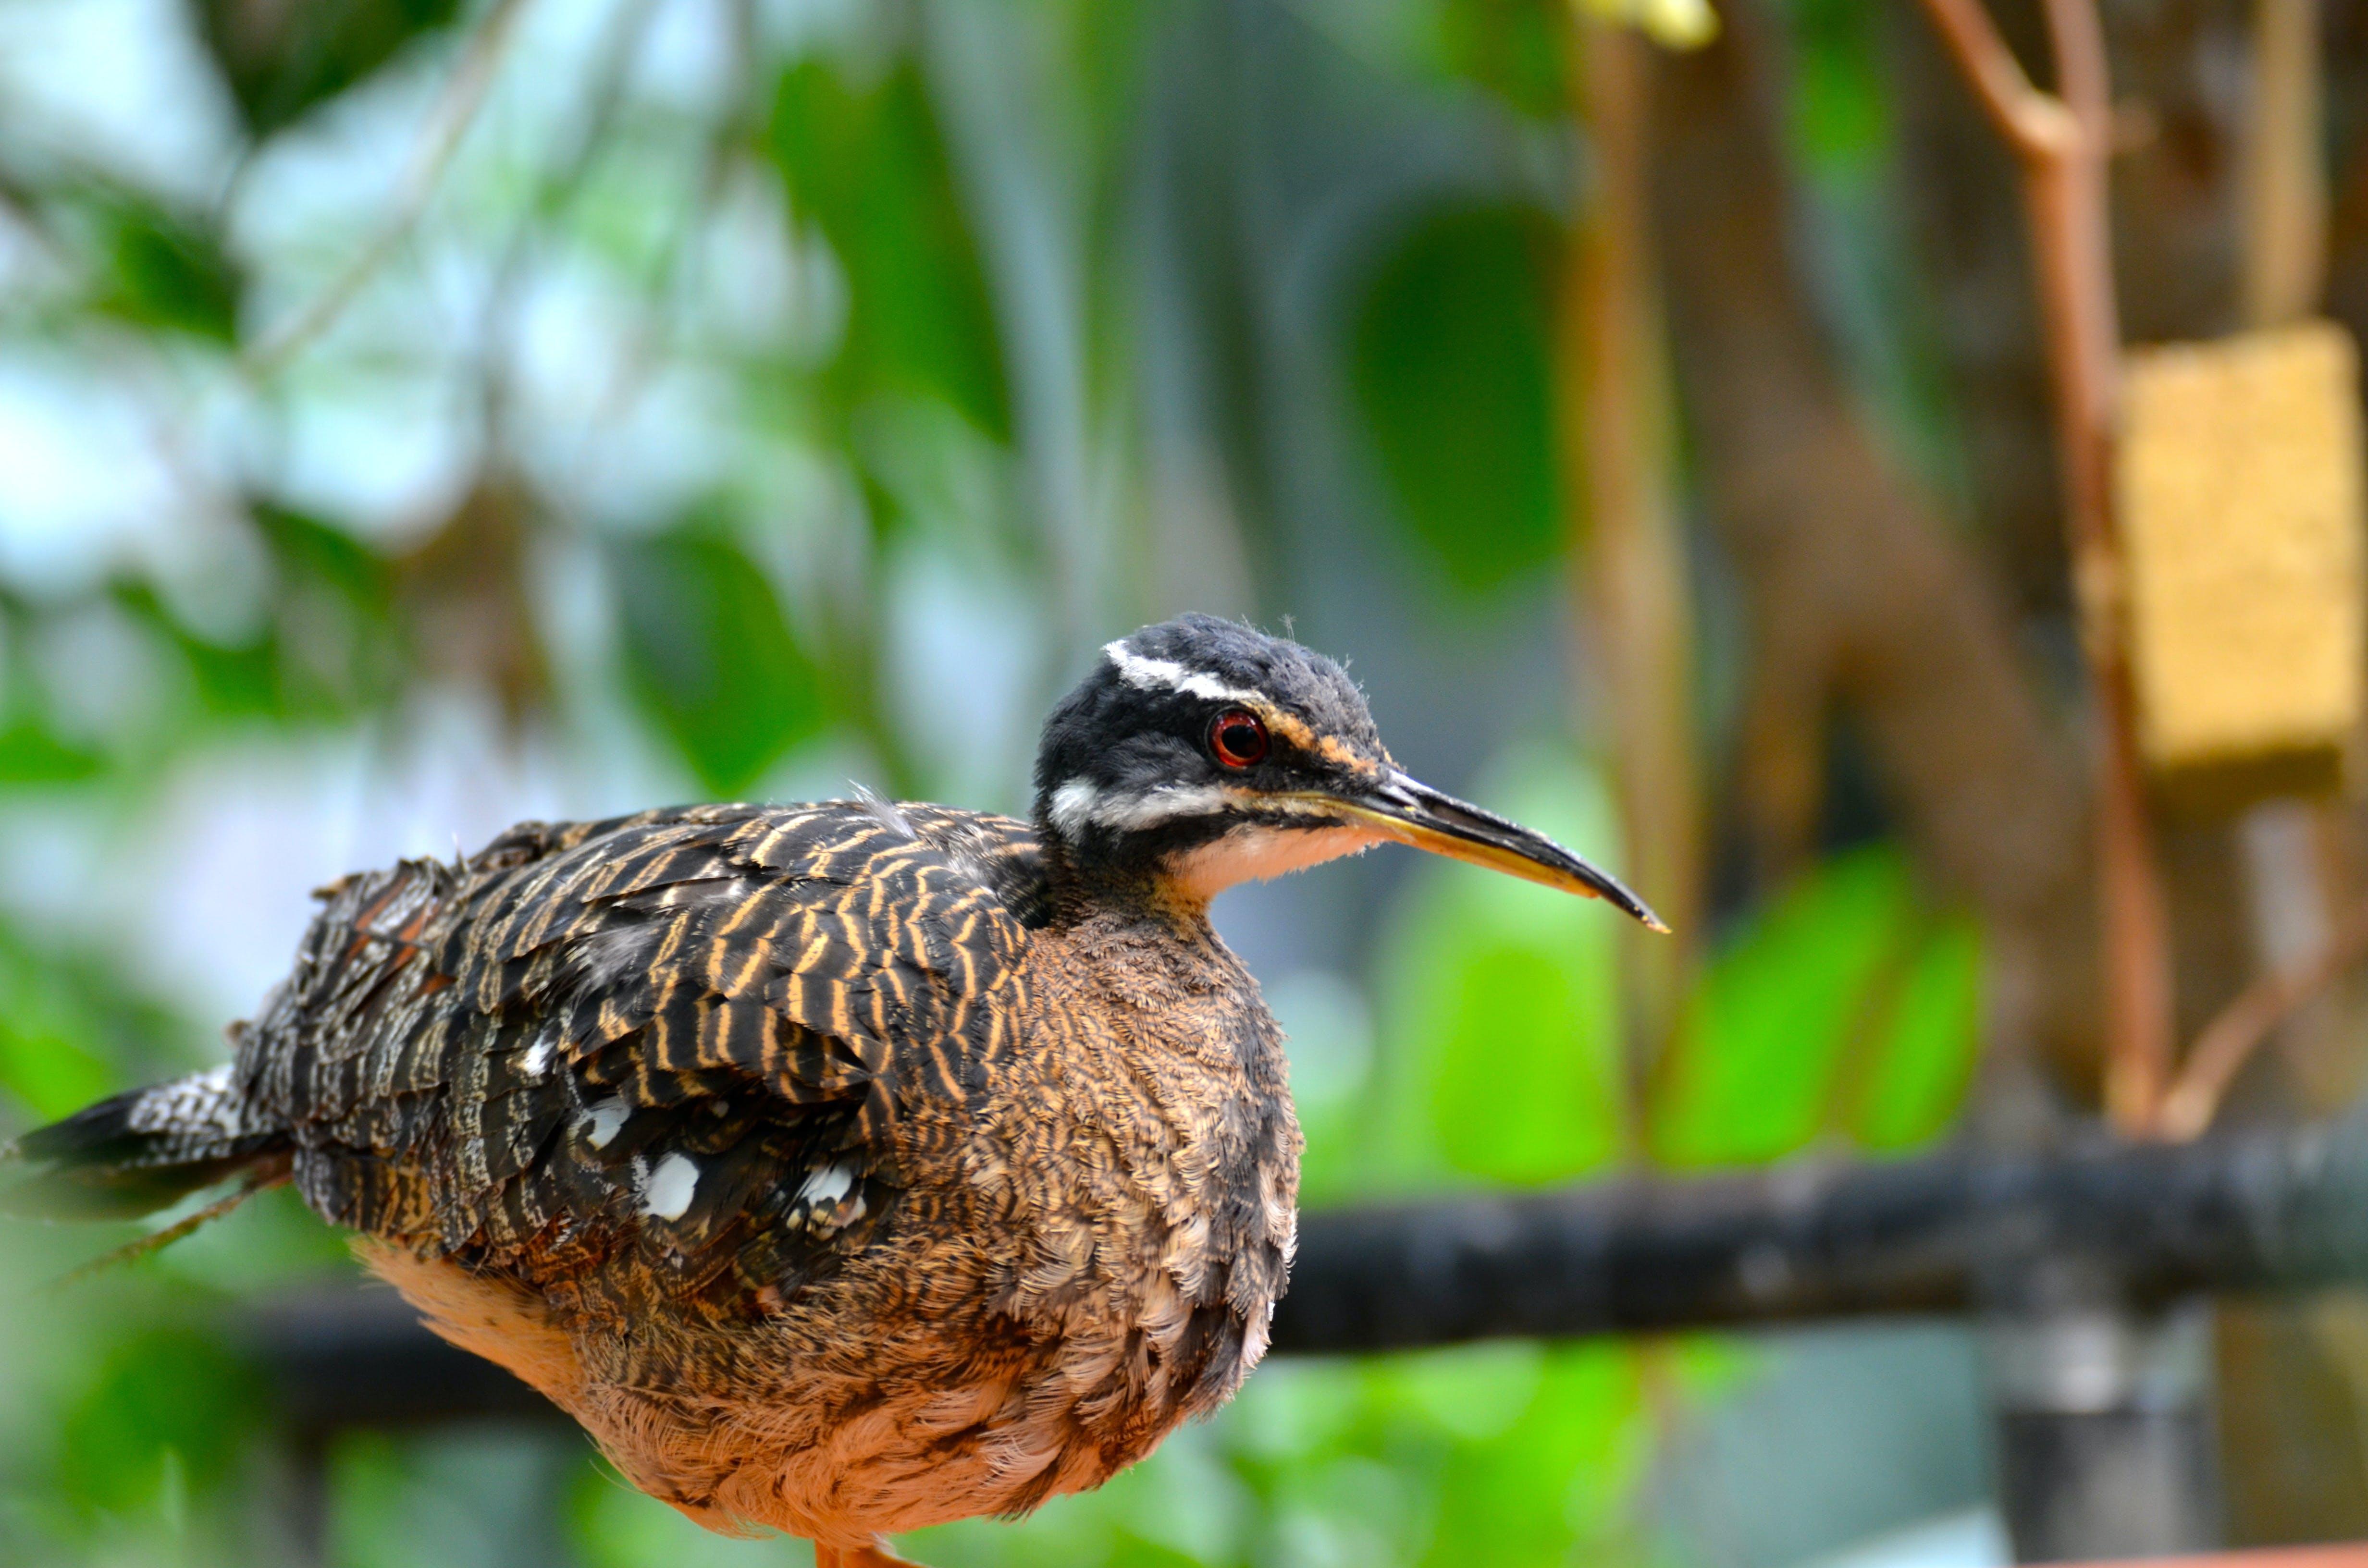 Free stock photo of nature, bird, animal, animal photography